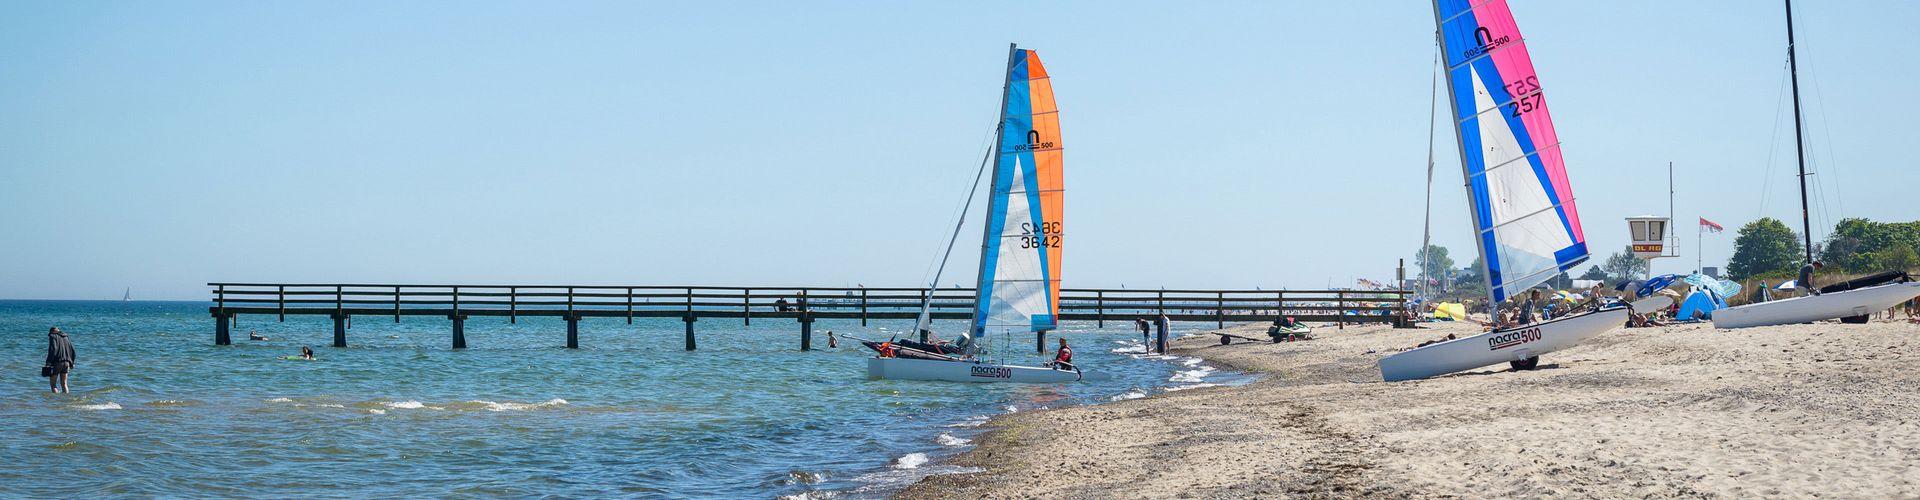 Wassersport im Ostseebad Dahme